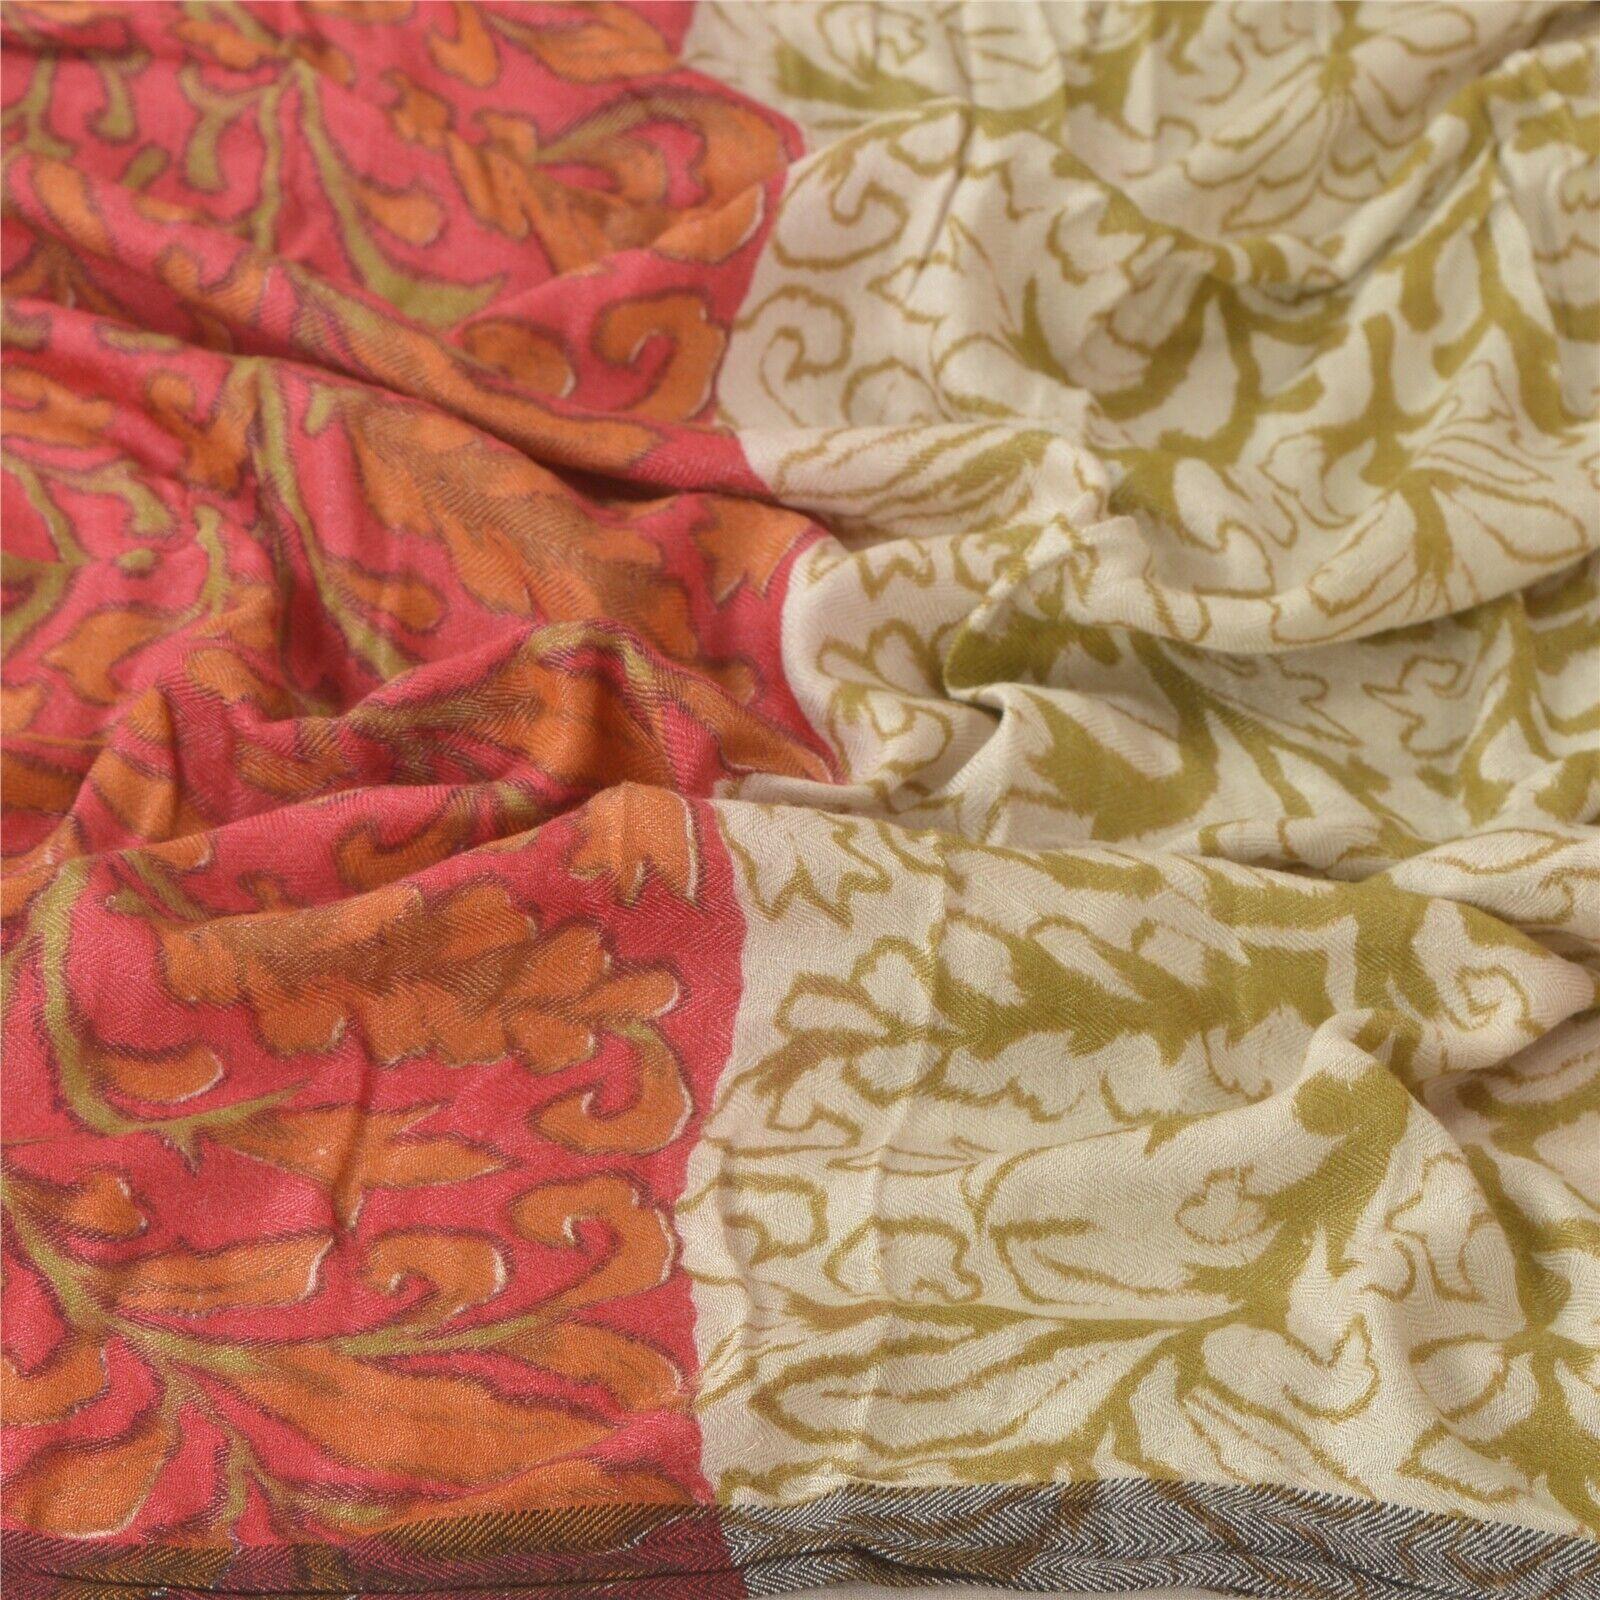 Sanskriti Vintage Dupatta Long Stole Woolen Cream Wrap Shawl Printed Scarves